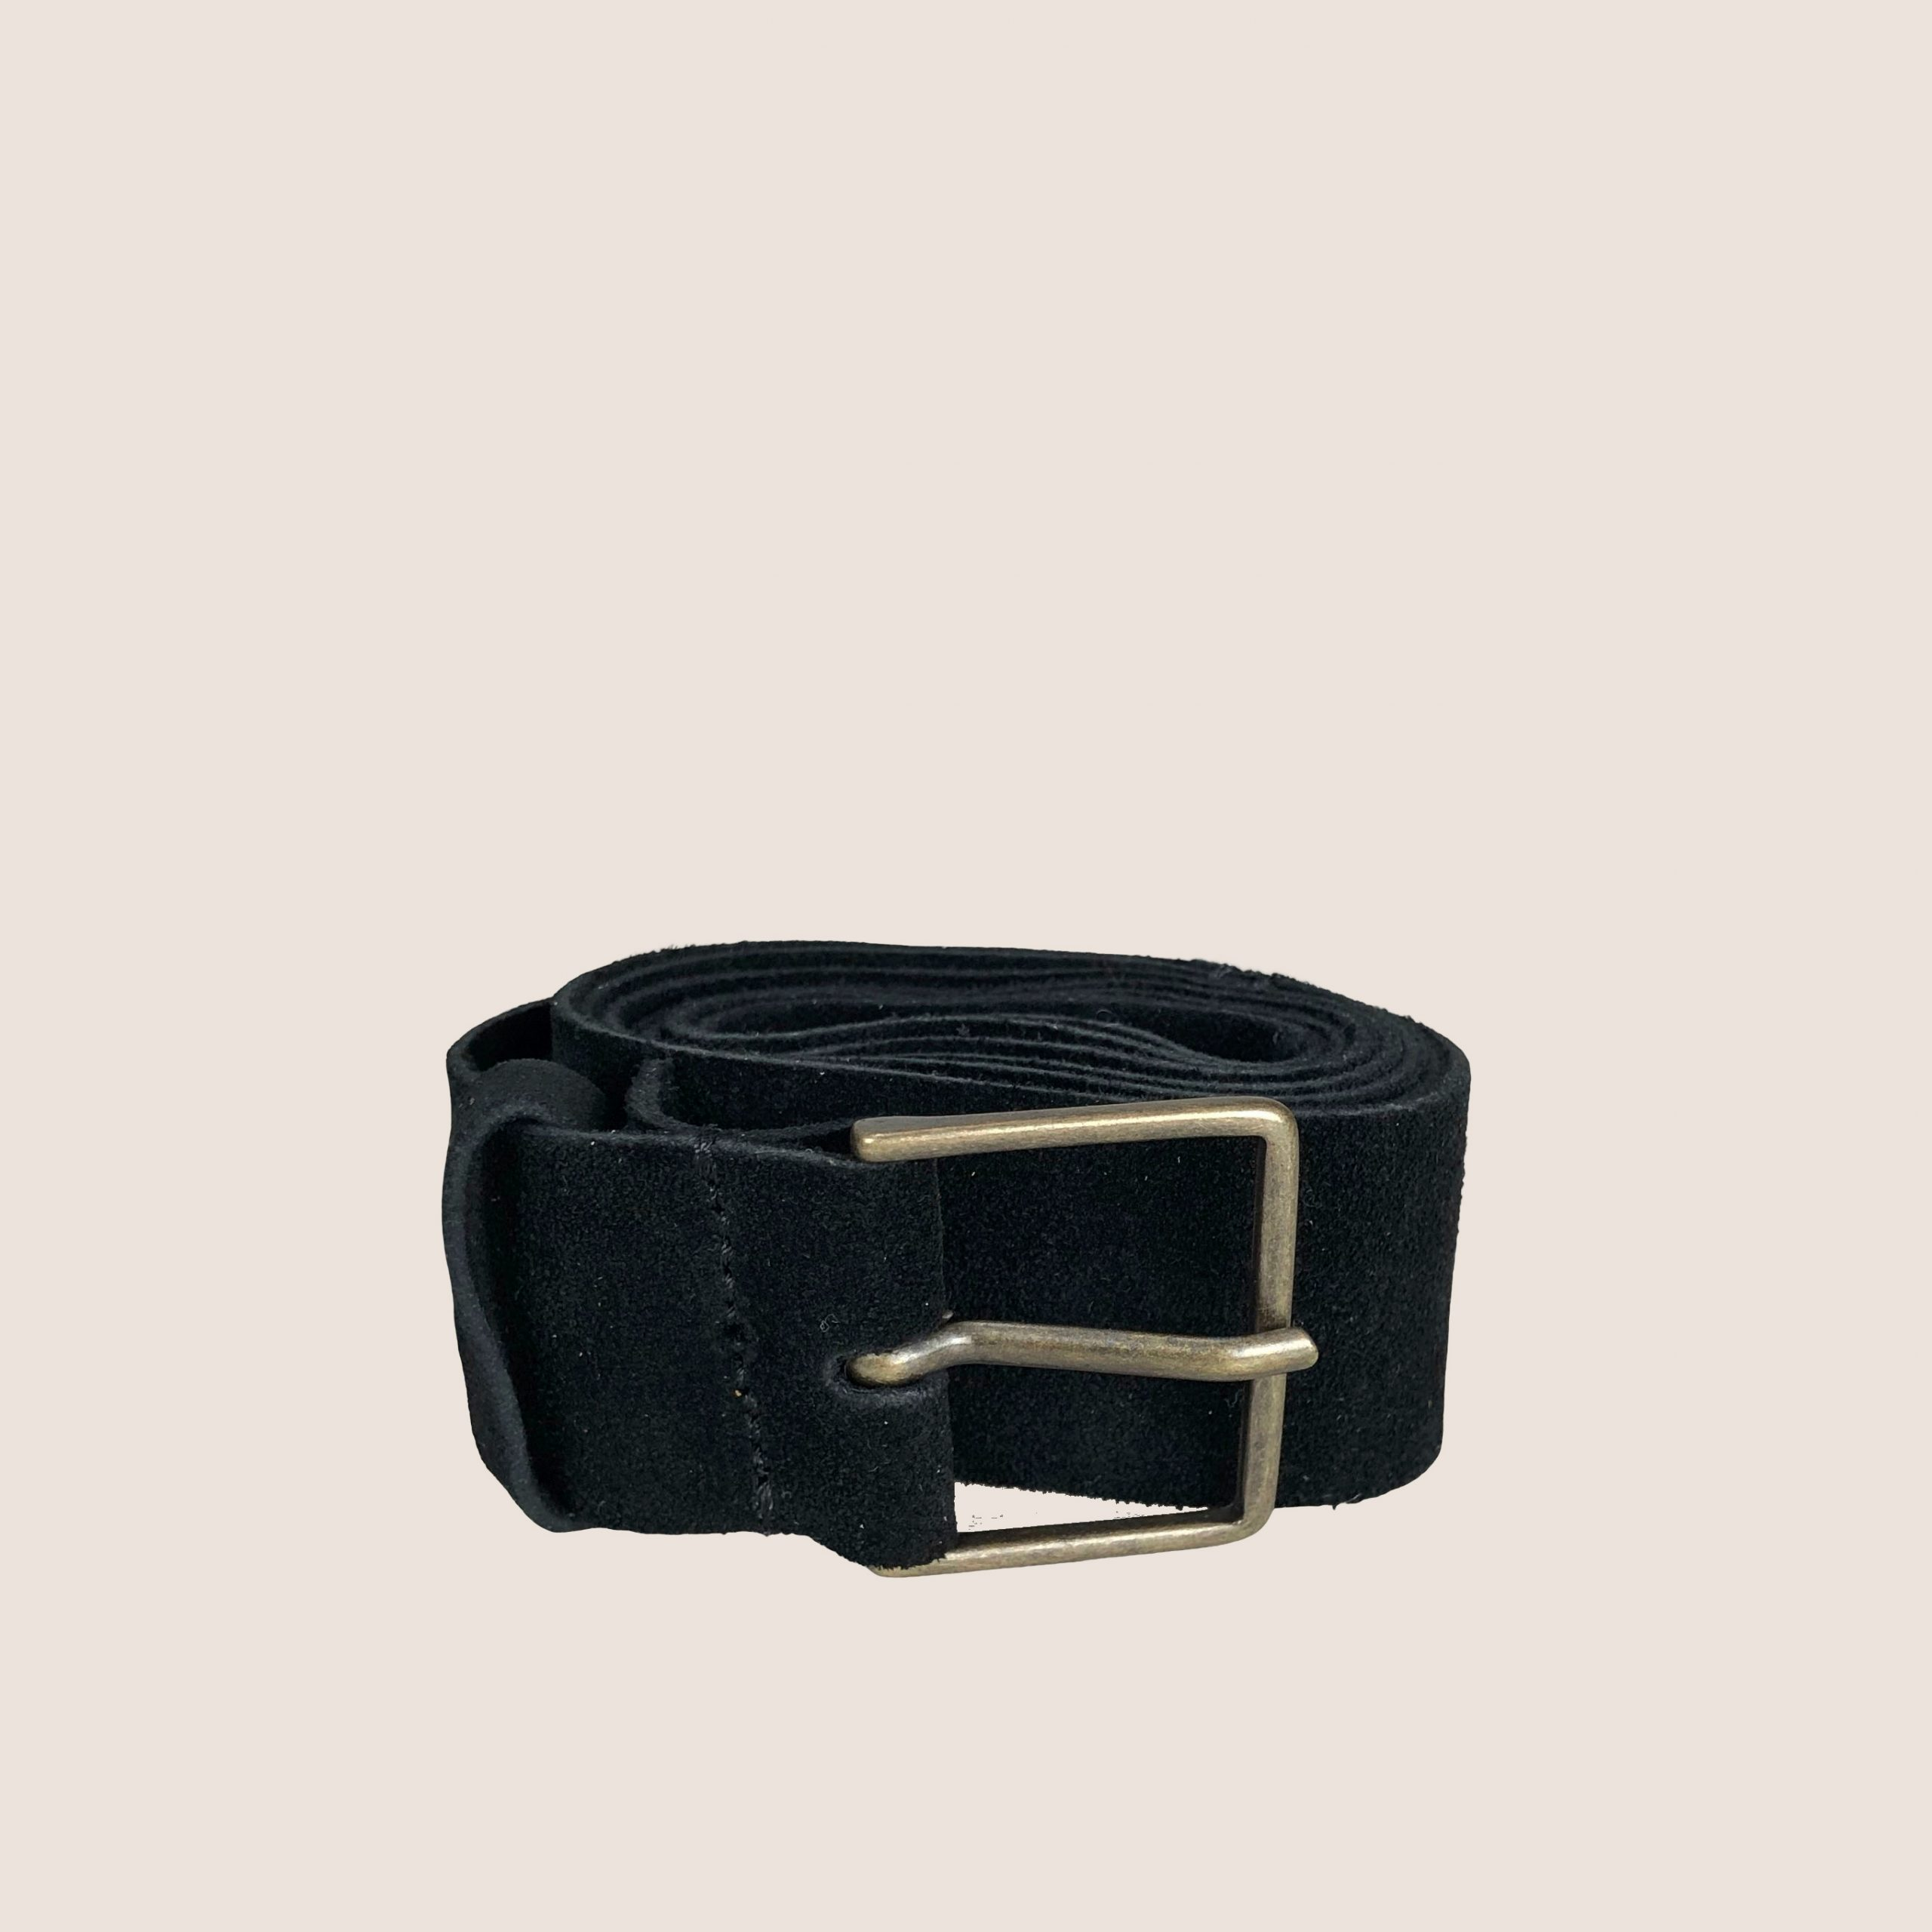 Lace Leather Belt